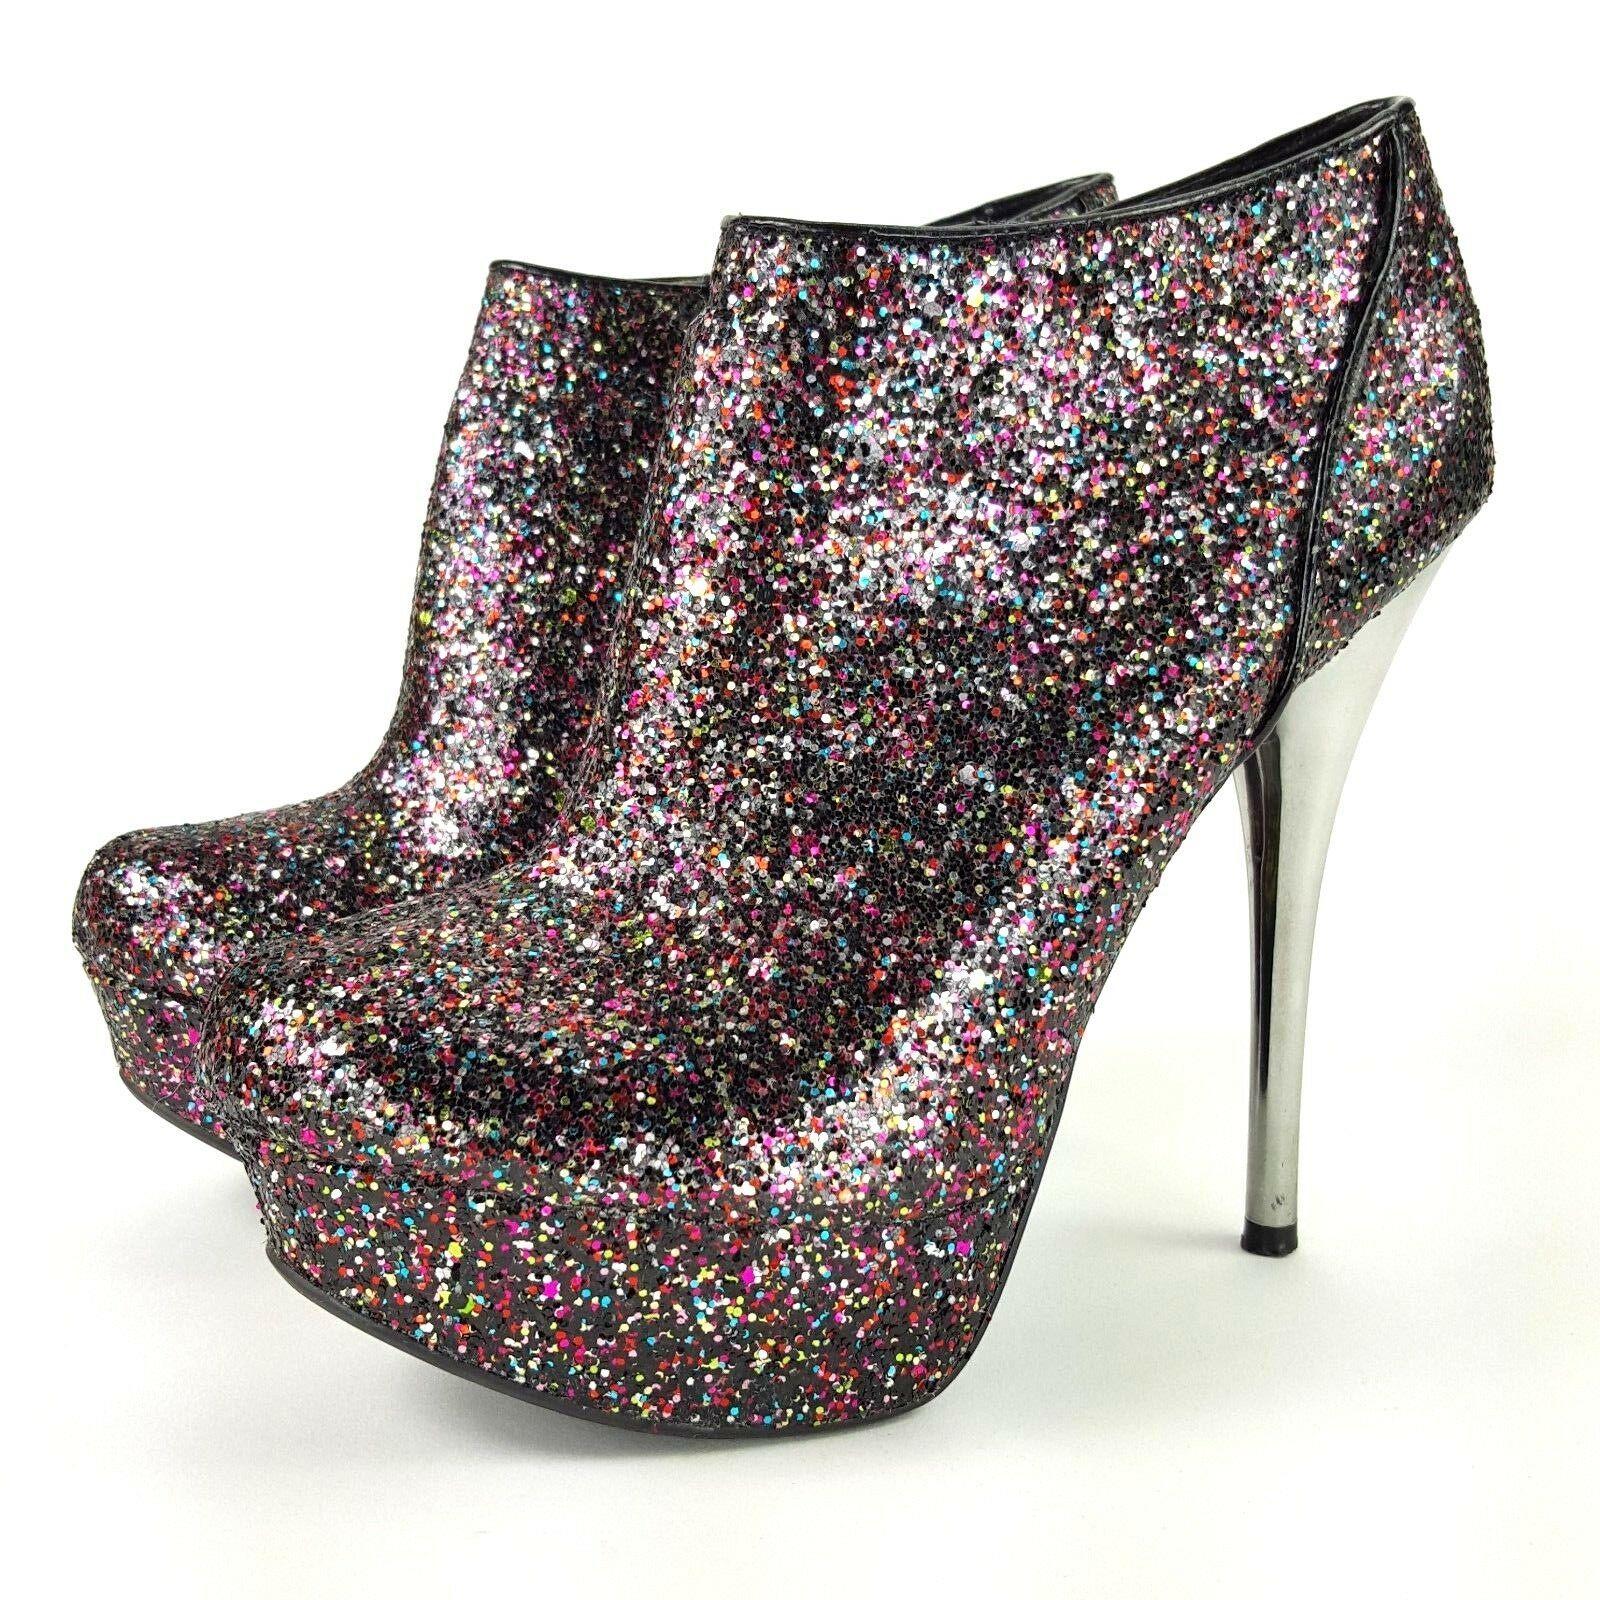 Qupid Womens Size 7.5 Glittery Clubbin Bootie Platform High Heels - $13.09